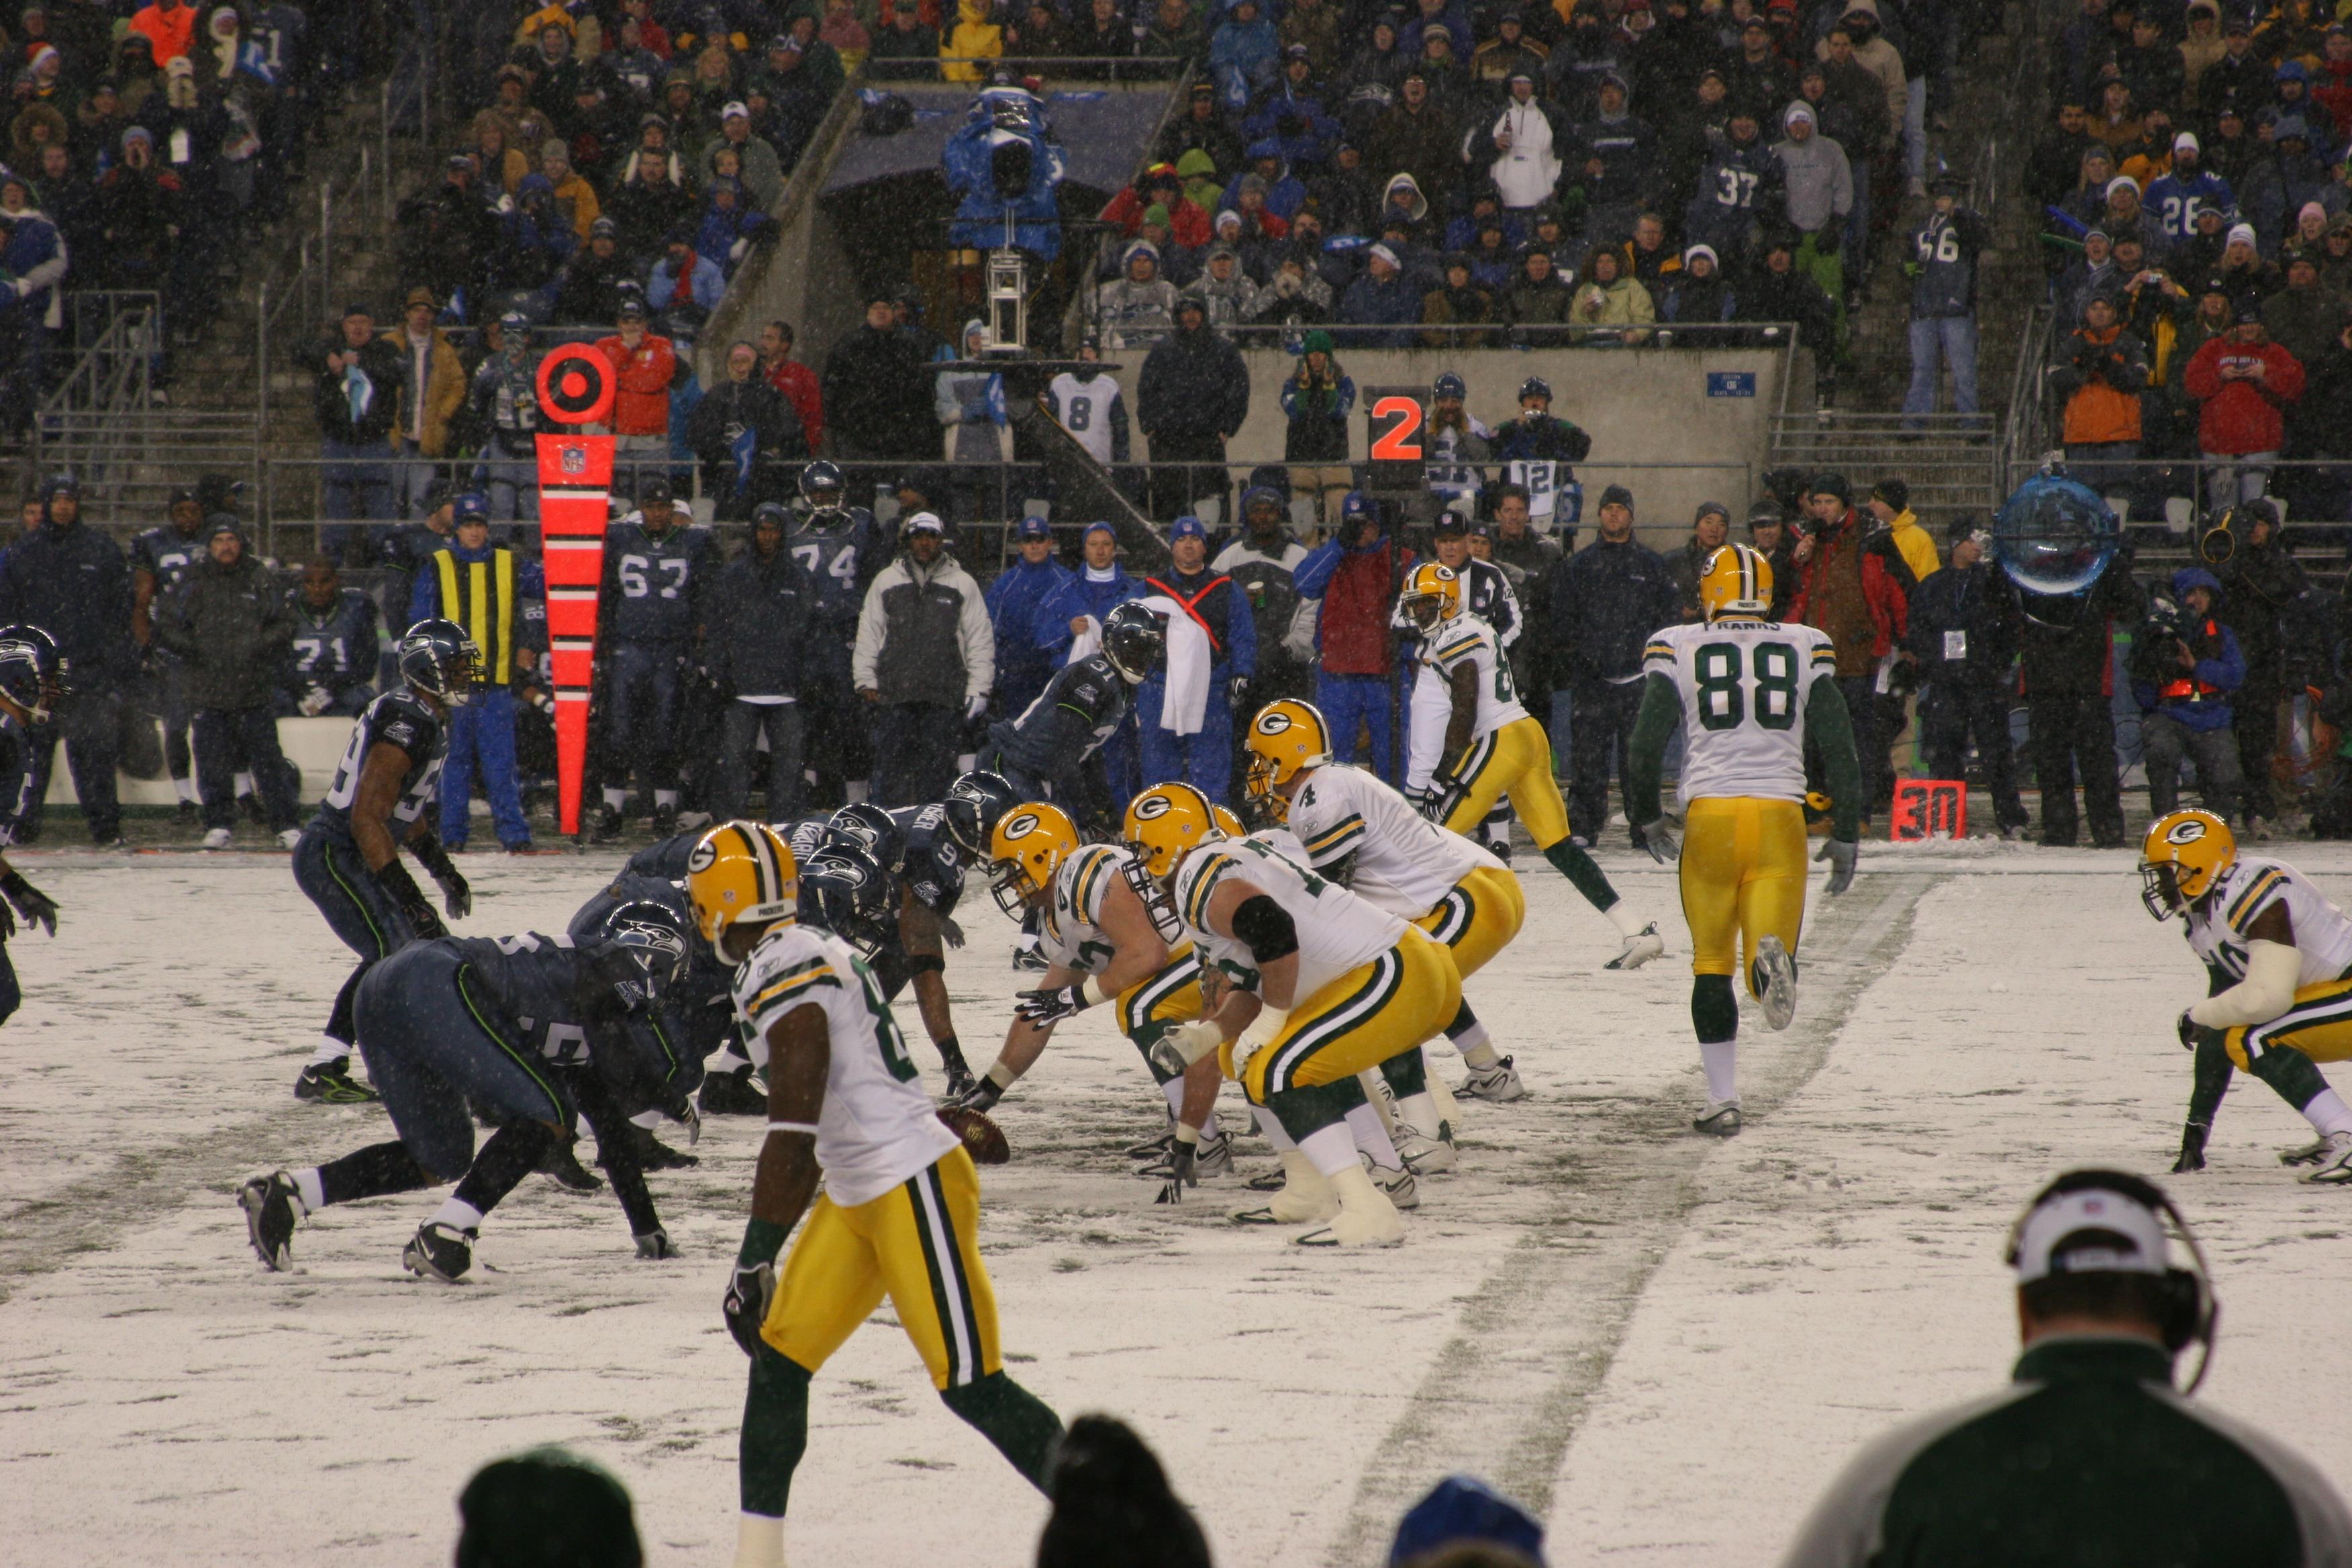 2006 Seattle Seahawks season - Wikipedia b7f5413a5